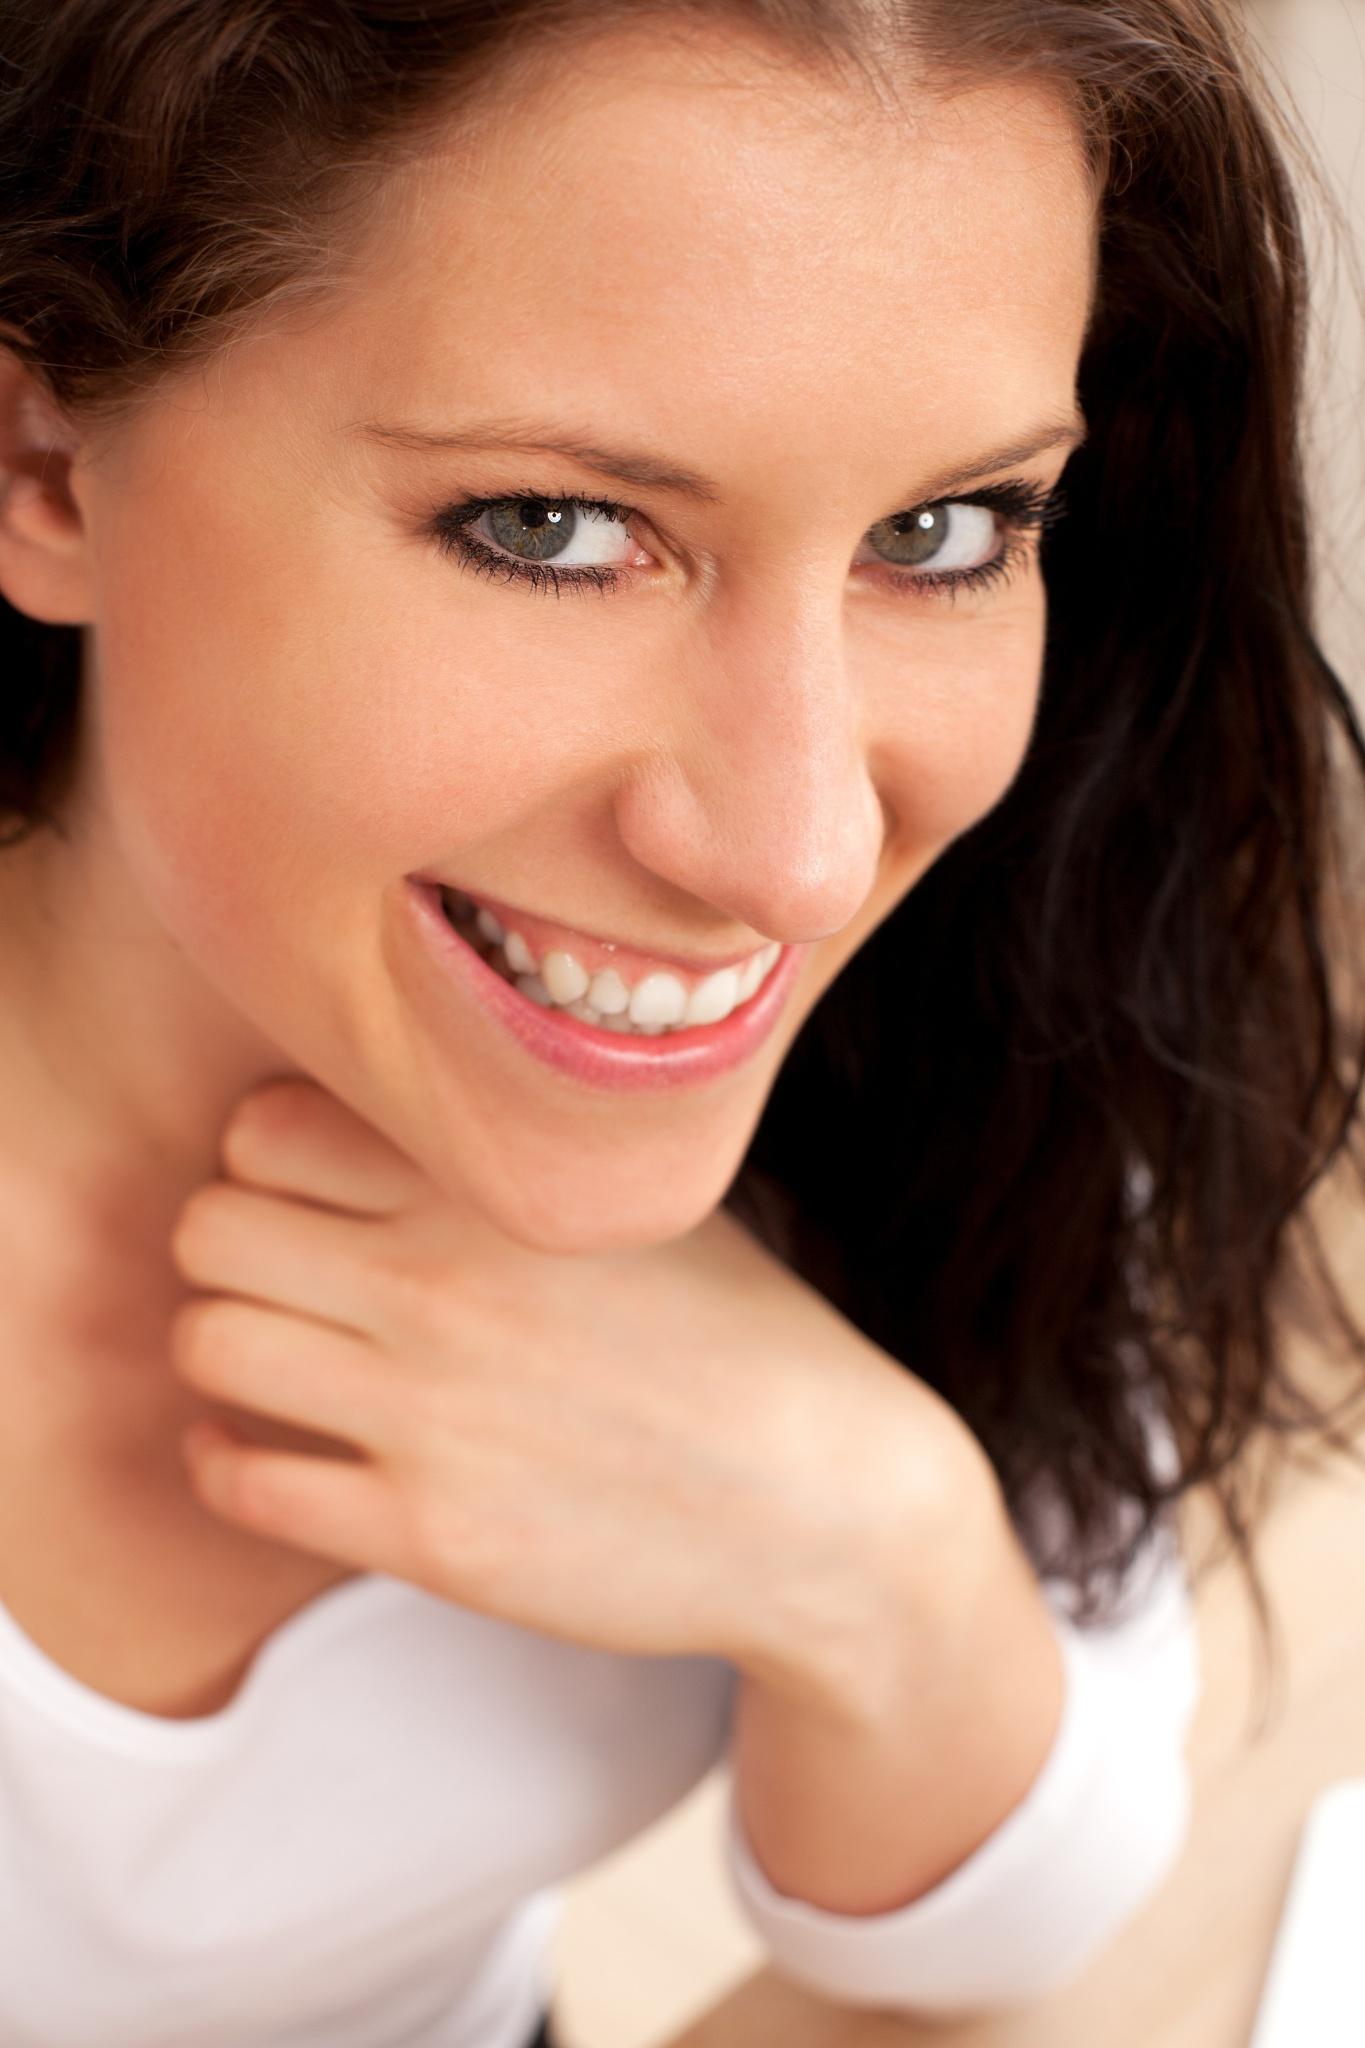 Dental implants in Alexandria